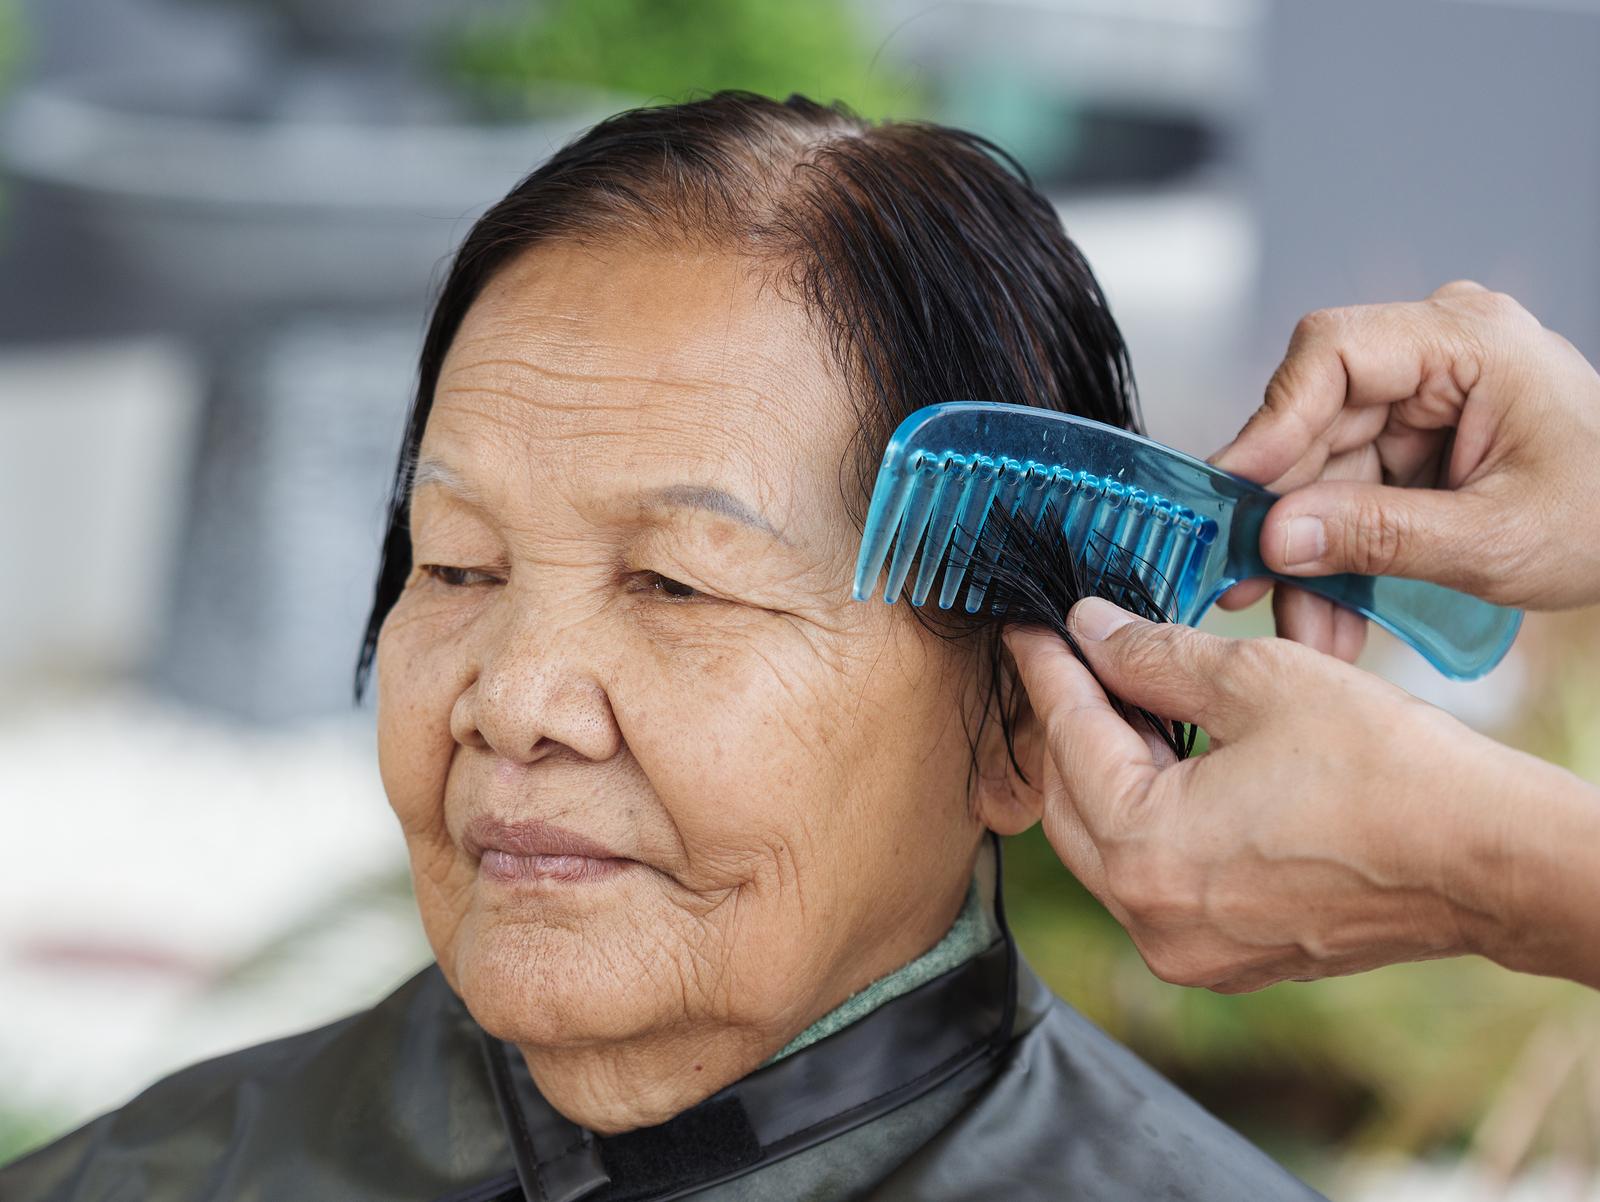 Elderly Care in Berwyn PA: Senior Hair Care